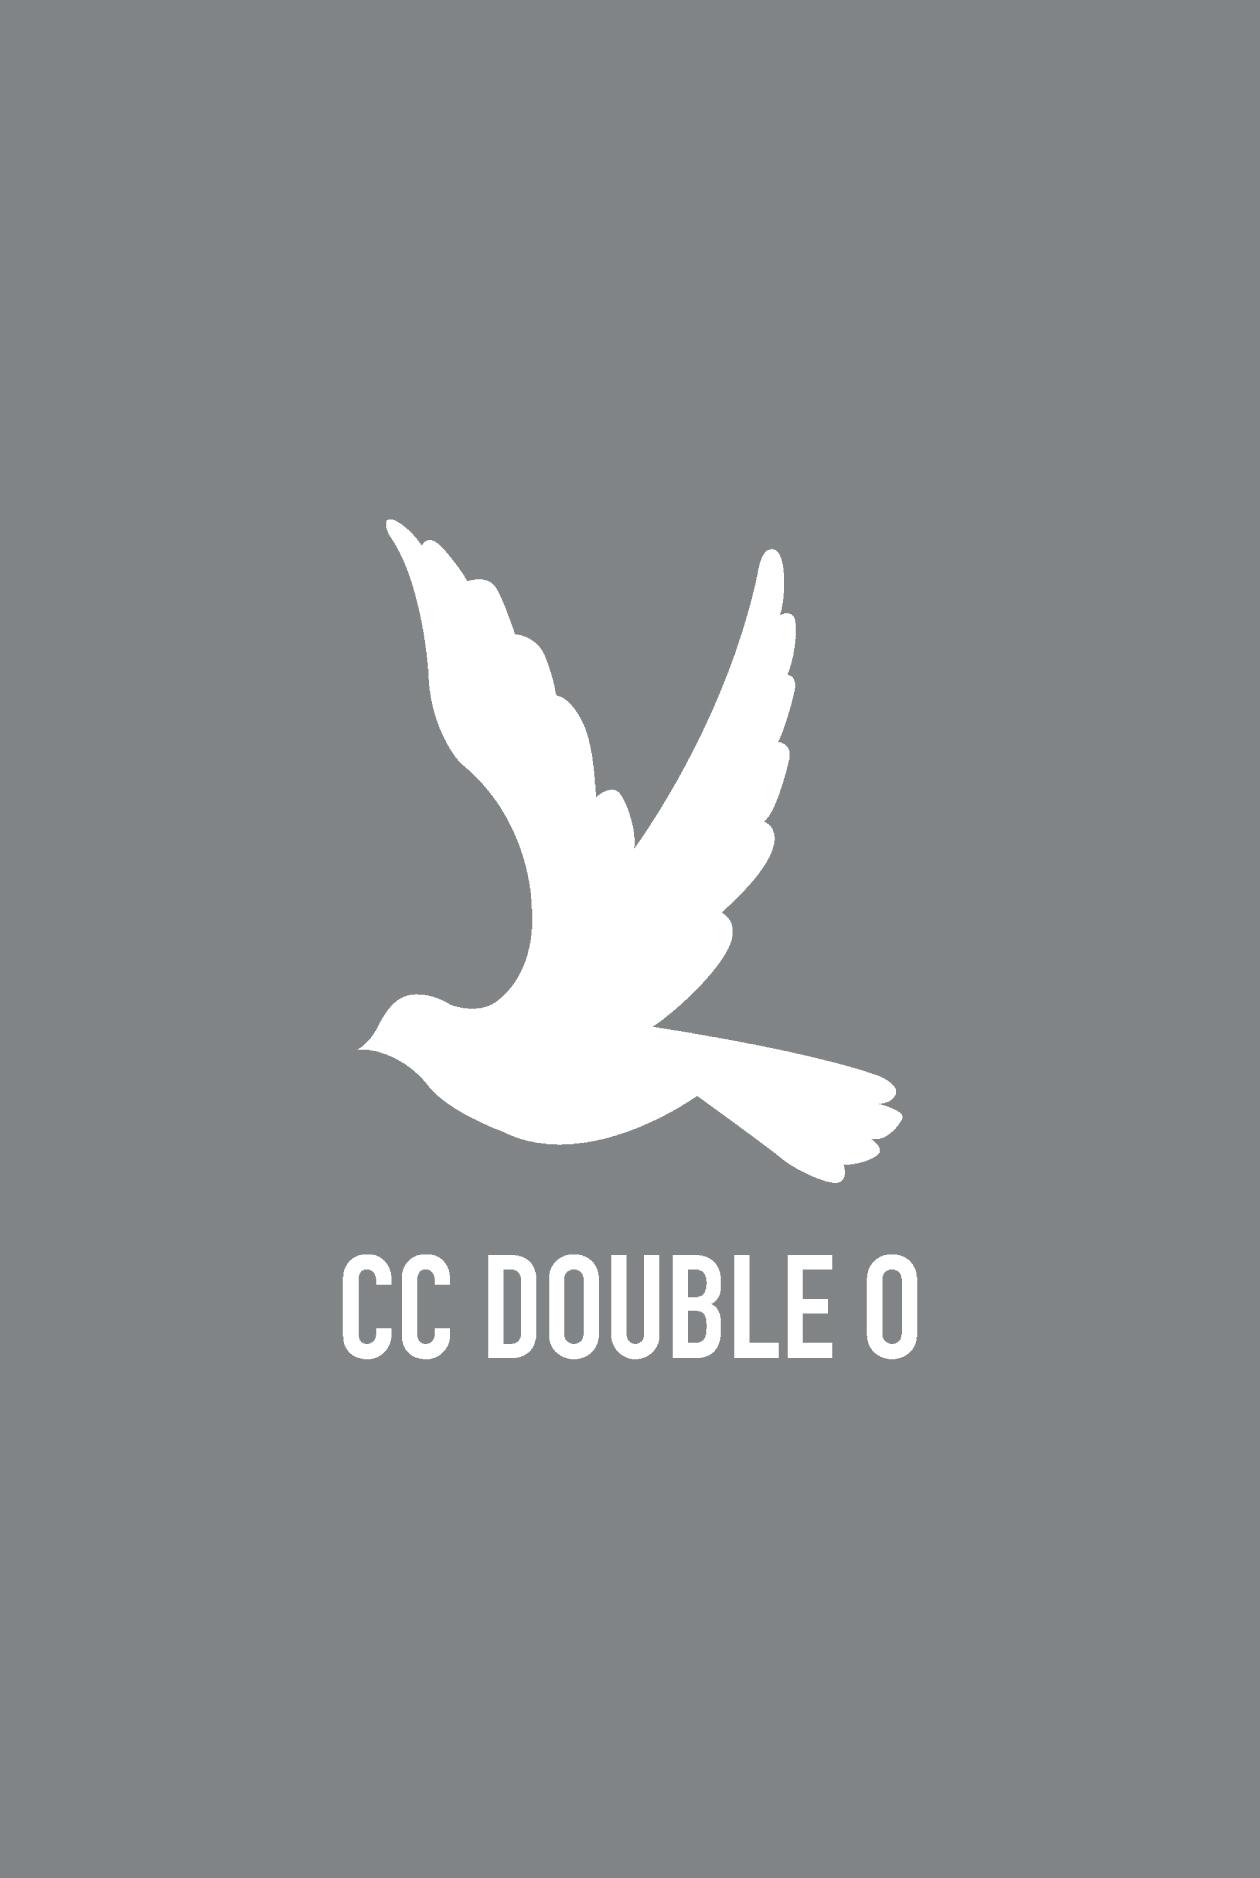 Bird Logo Cap with CC OO Logo Detail